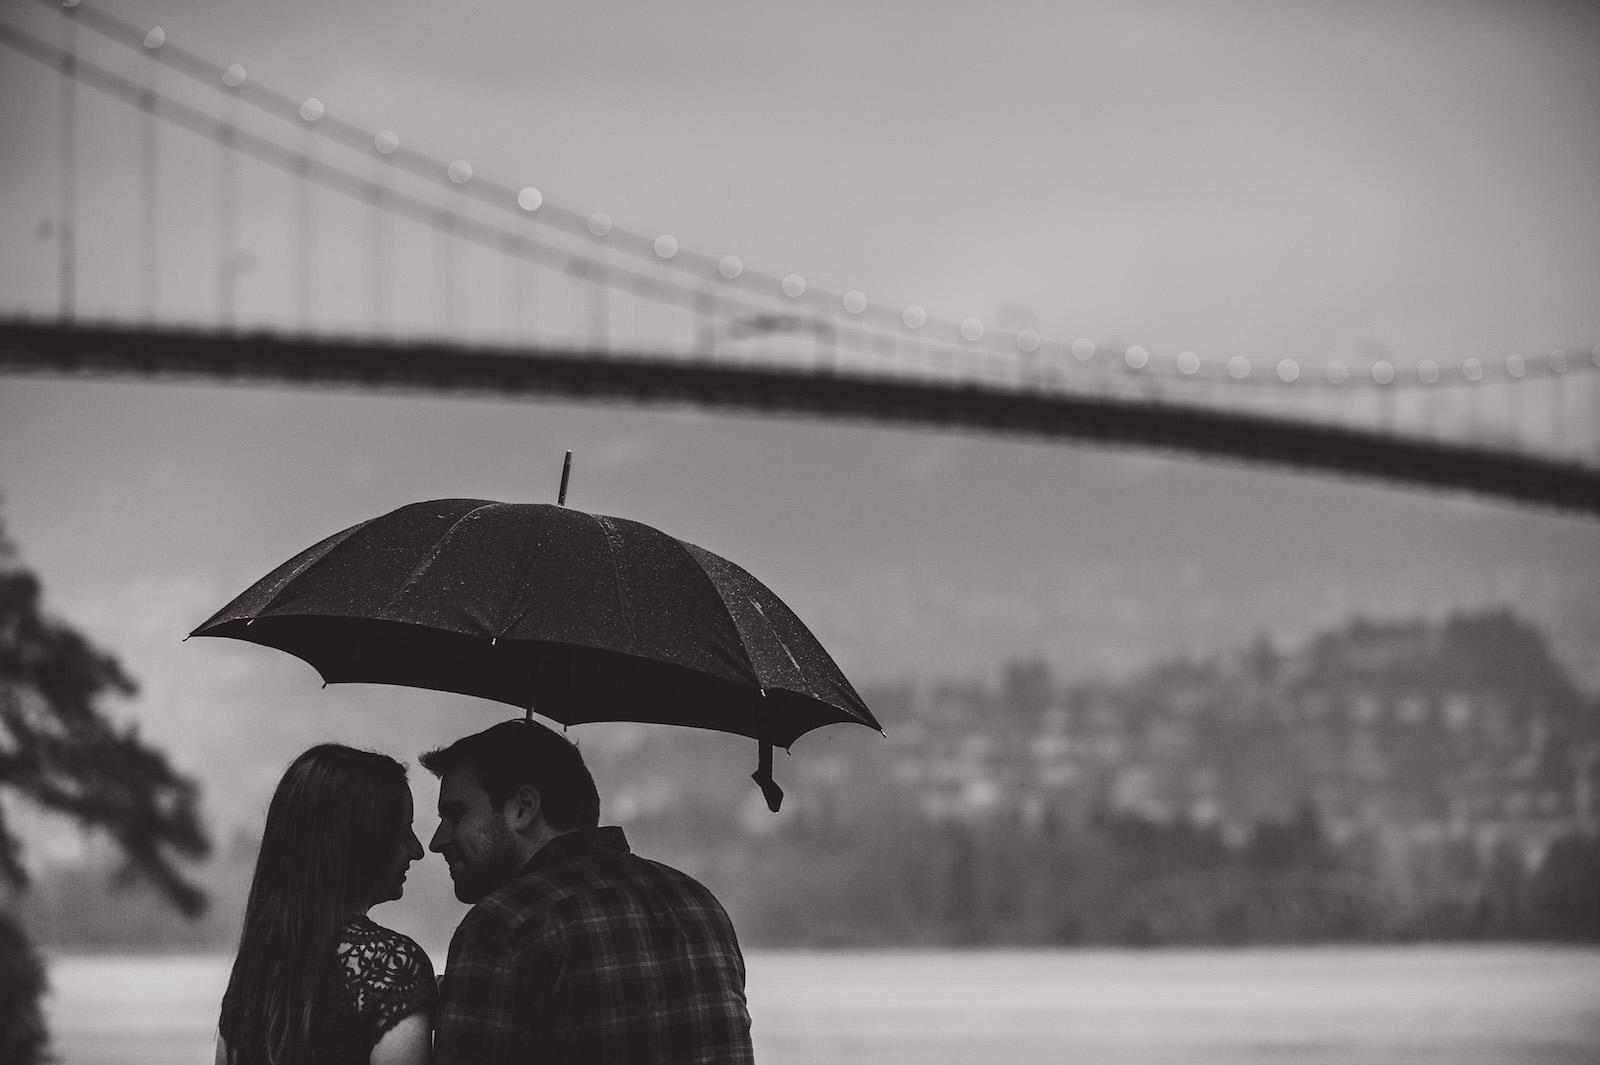 vancouver-island-wedding-photographers-rainy-stanley-park-engagement-12.jpg